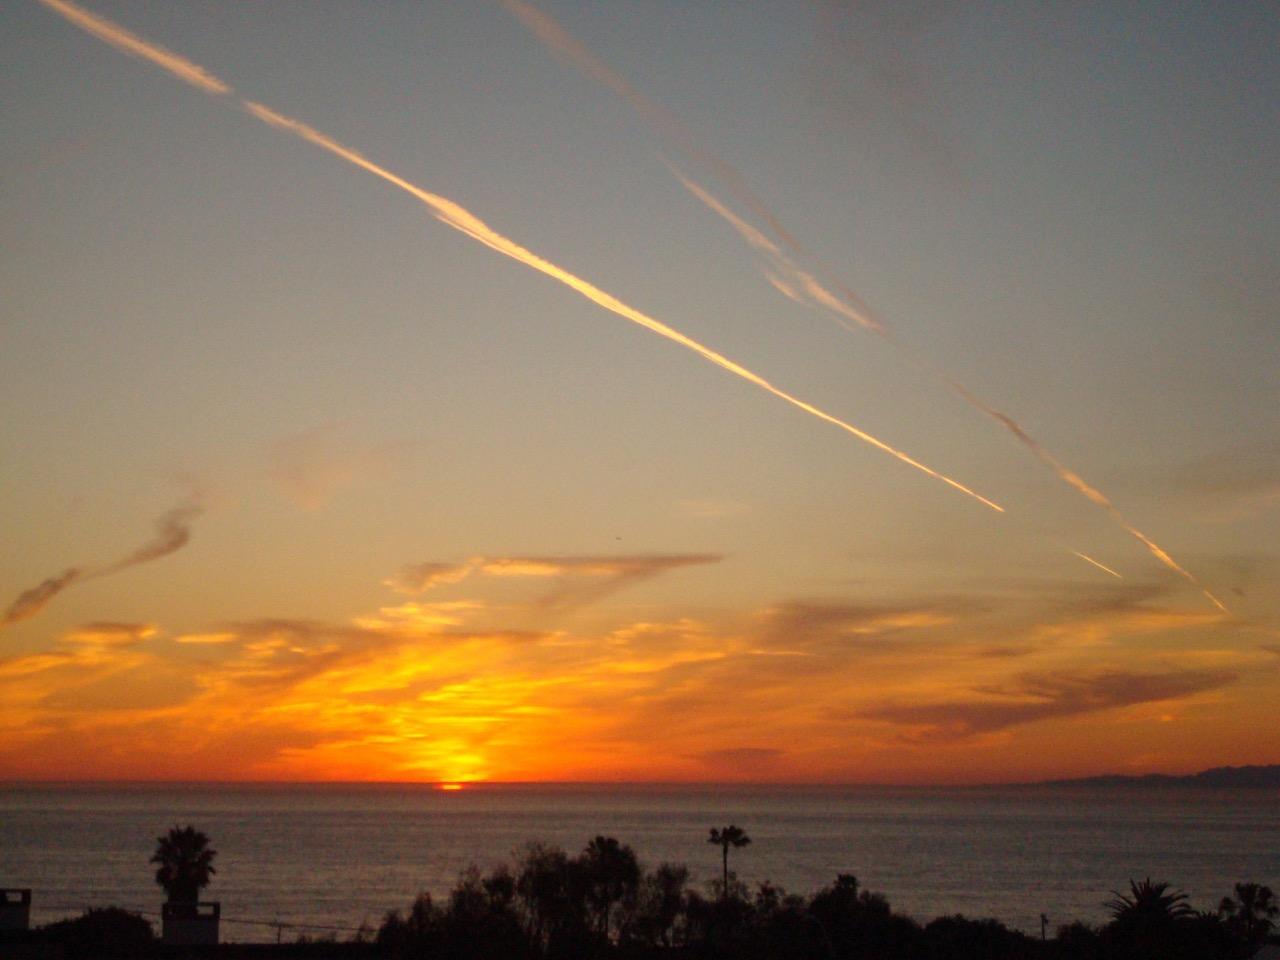 419-Camino-De-Las-Colinas-sunset-view1-from-Linda